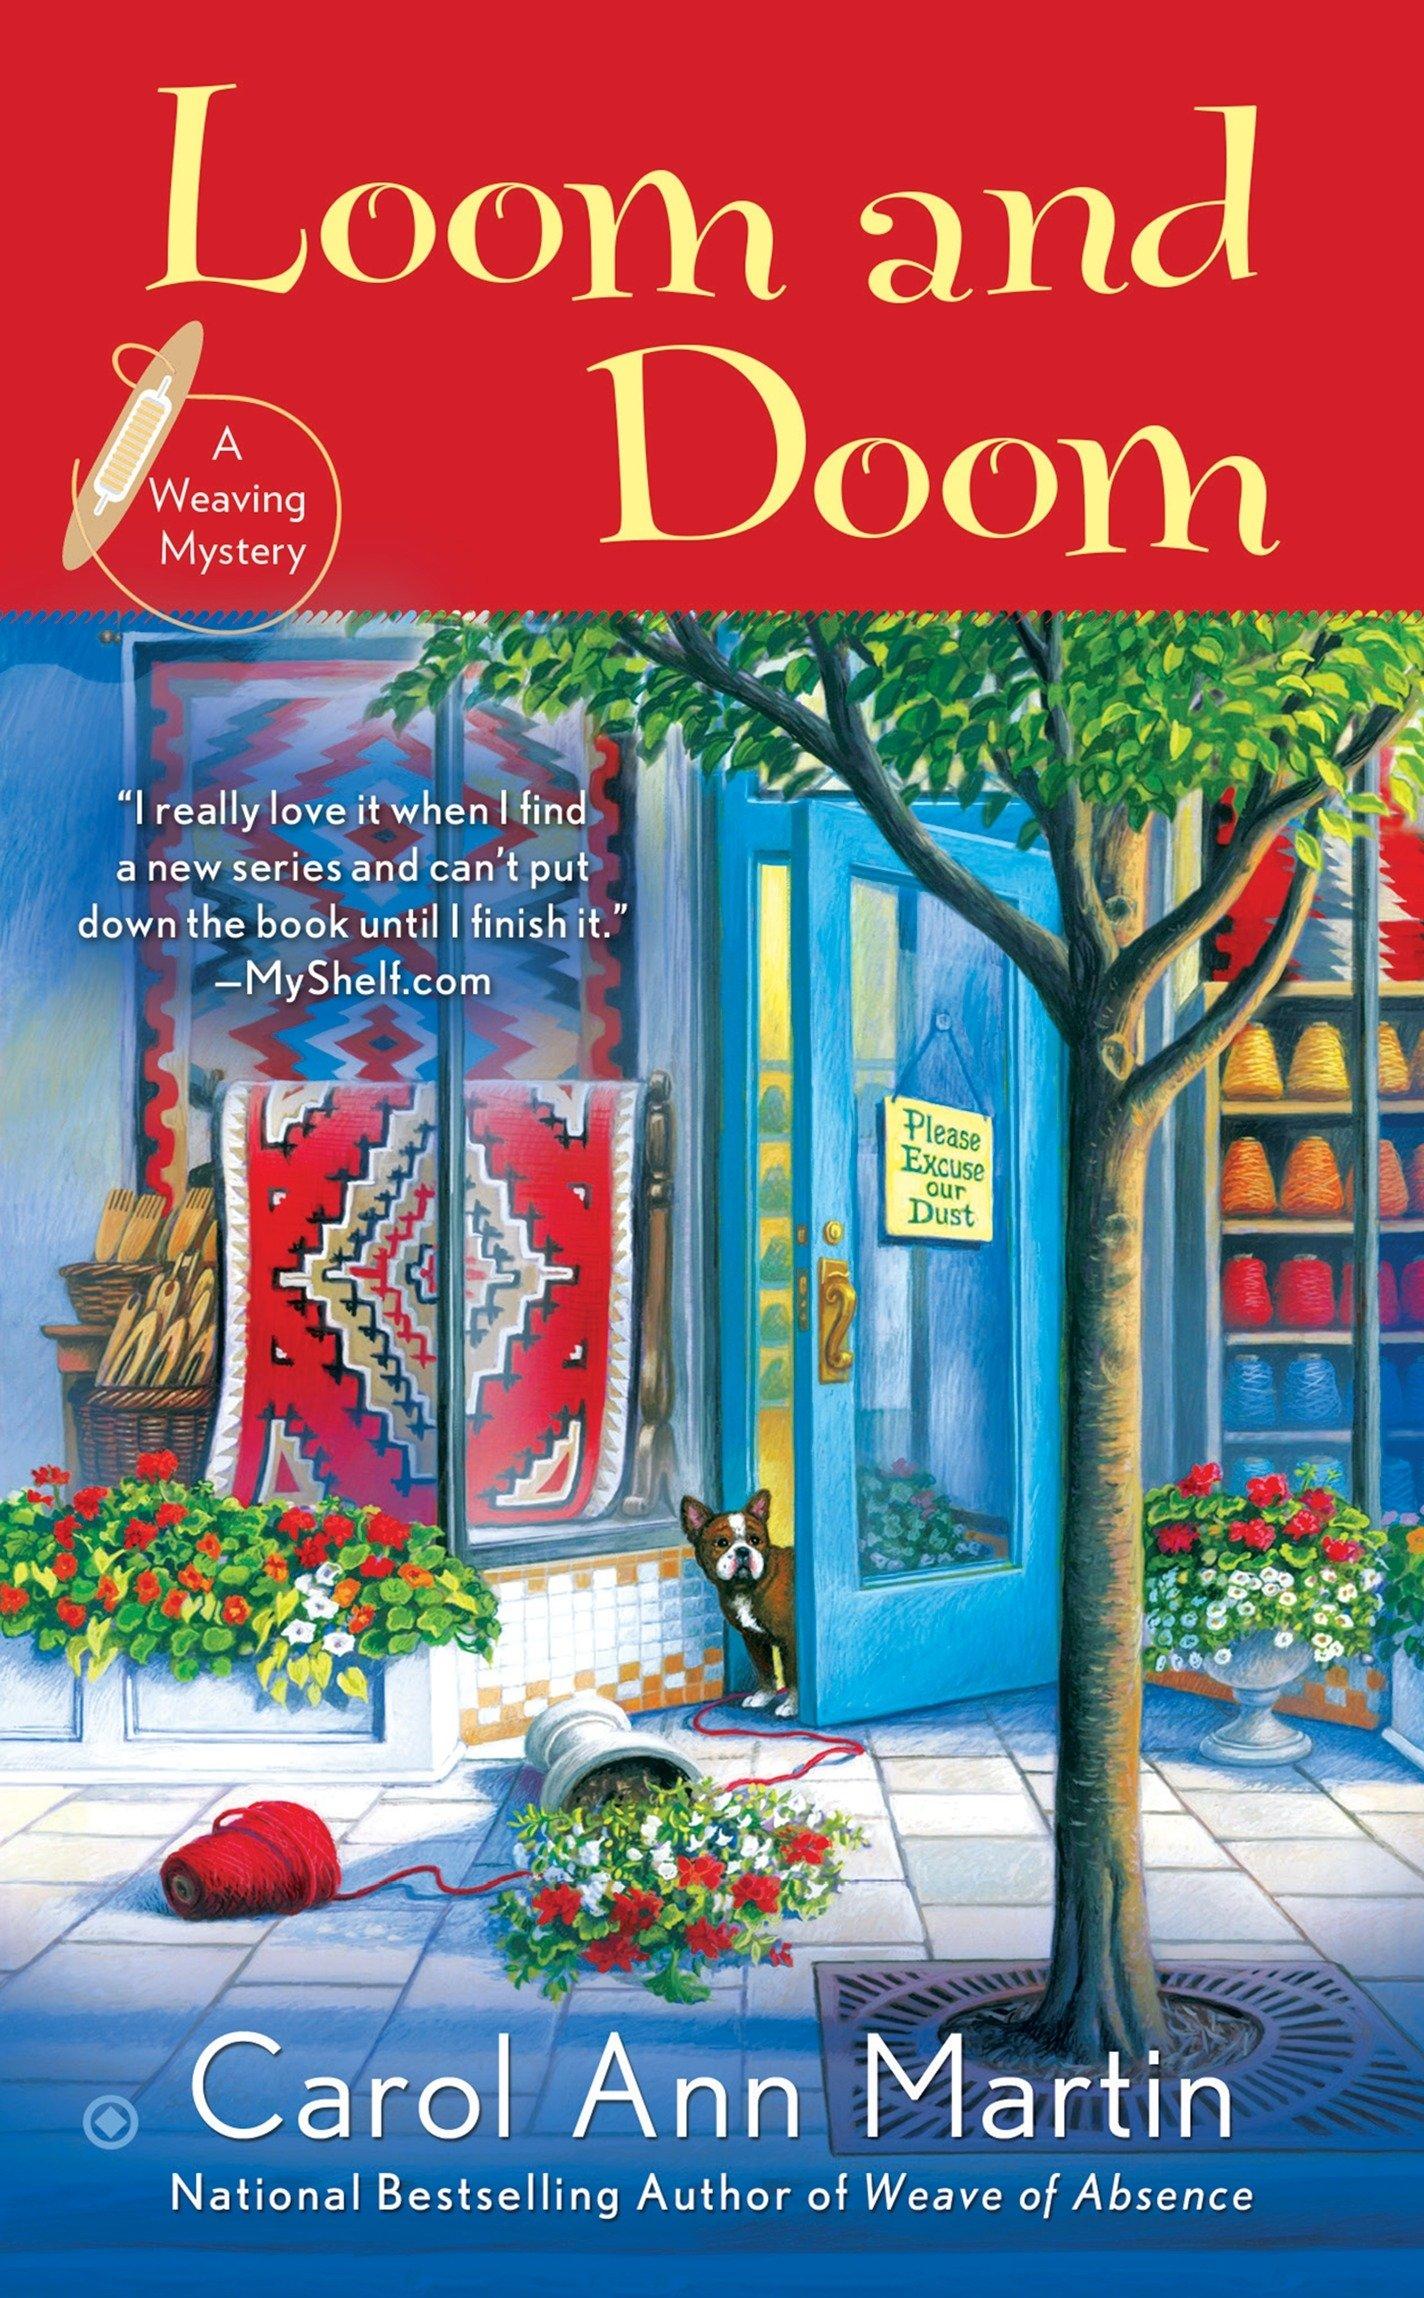 Amazon Com Loom And Doom A Weaving Mystery 9780451474889 Martin Carol Ann Books South la power fest presented by community coalition. loom and doom a weaving mystery